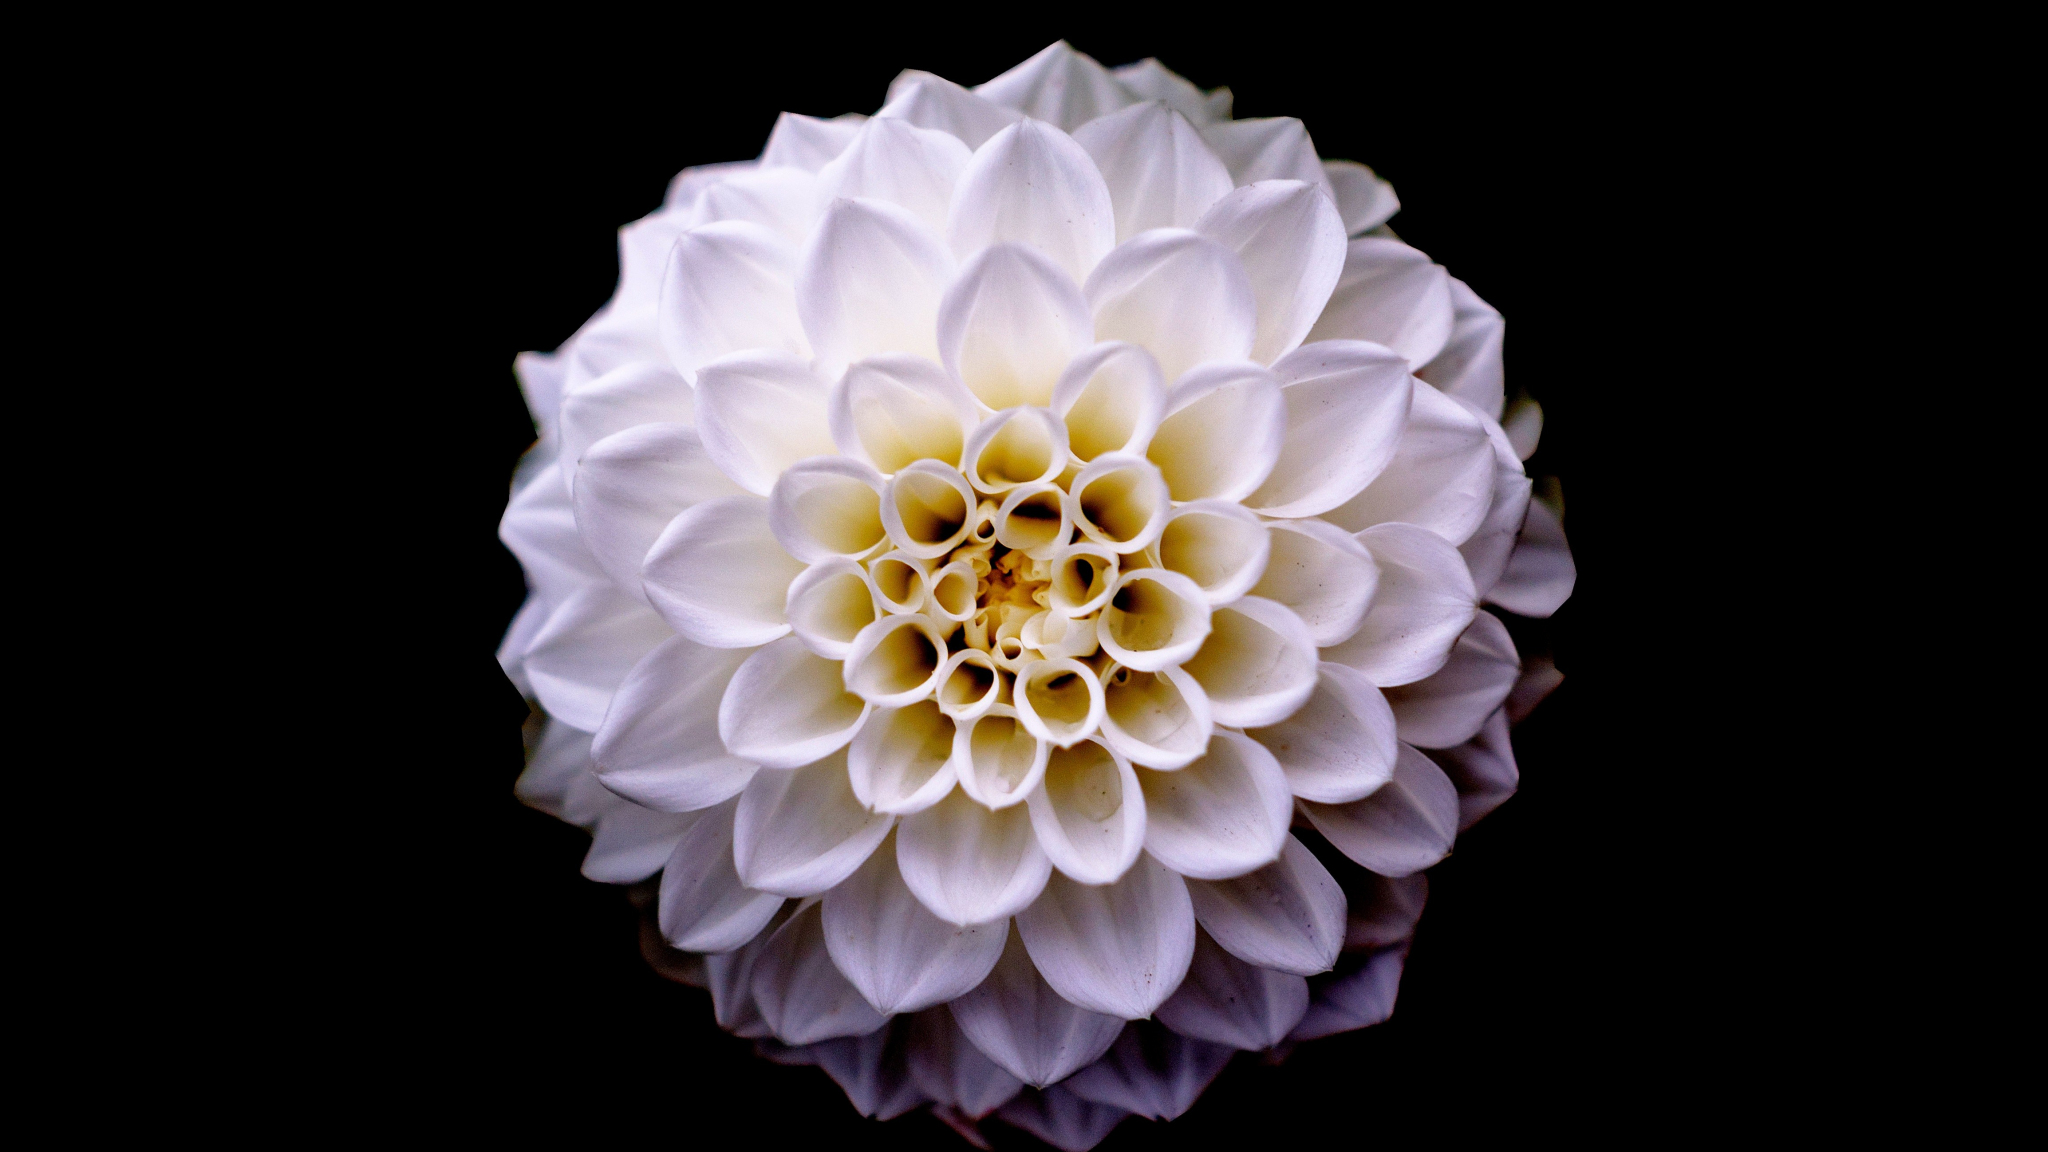 Dahlia, flower, portrait, 2048x1152 wallpaper